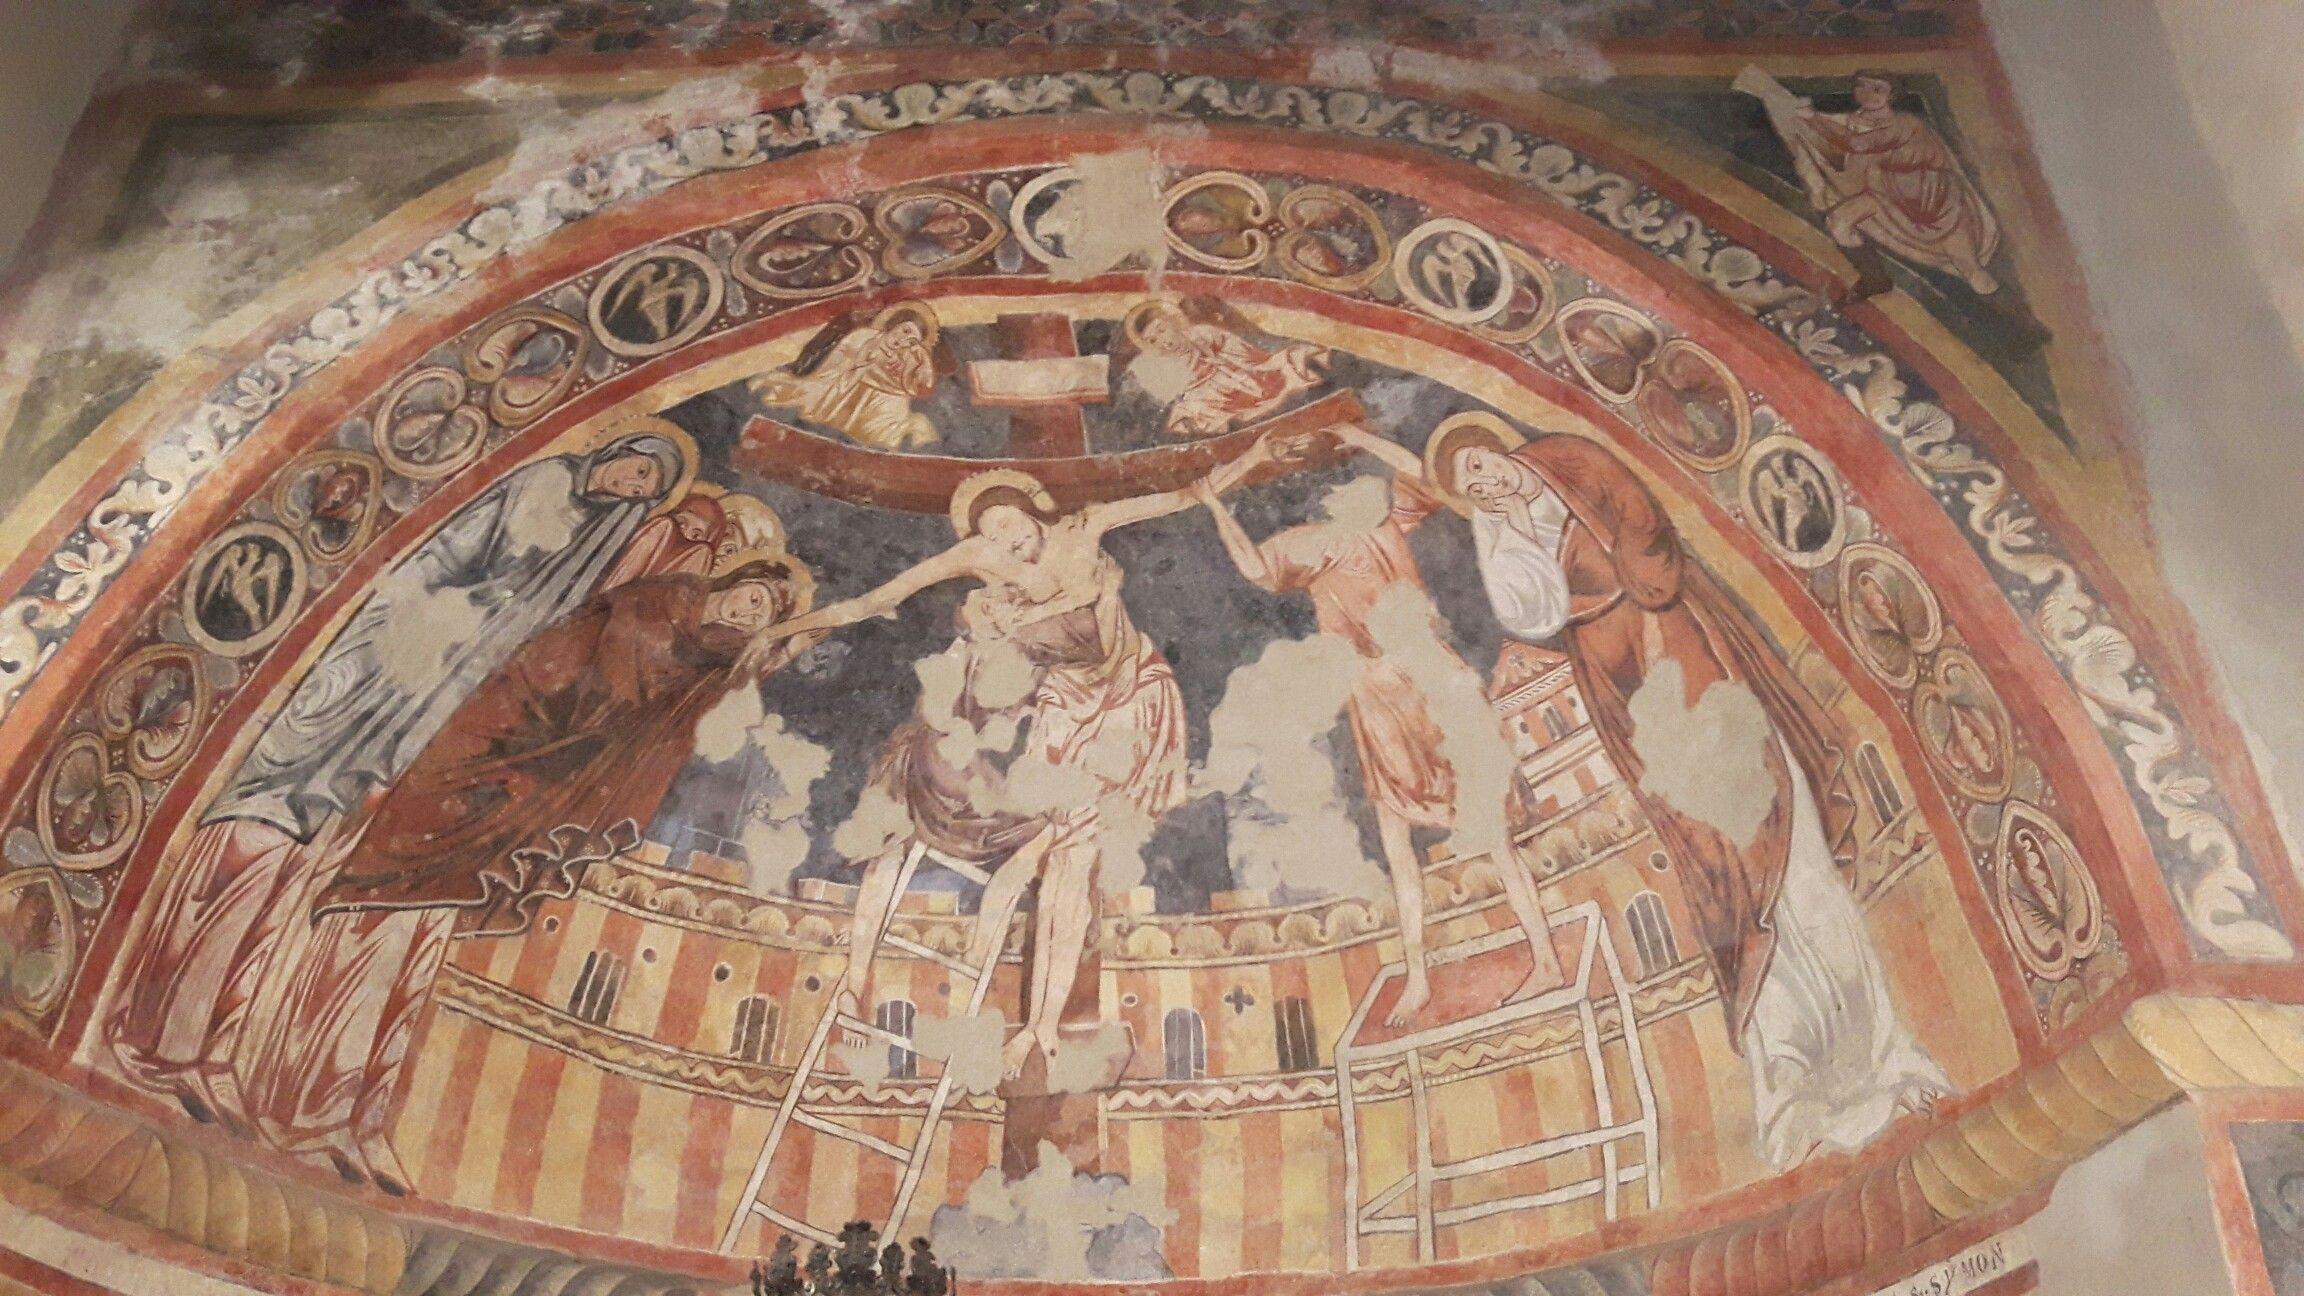 Chiesa di Santa Maria di Castello. Udine. Abside destra. XIII sec. Iconografia bizantina da Vangeli Apocrifi